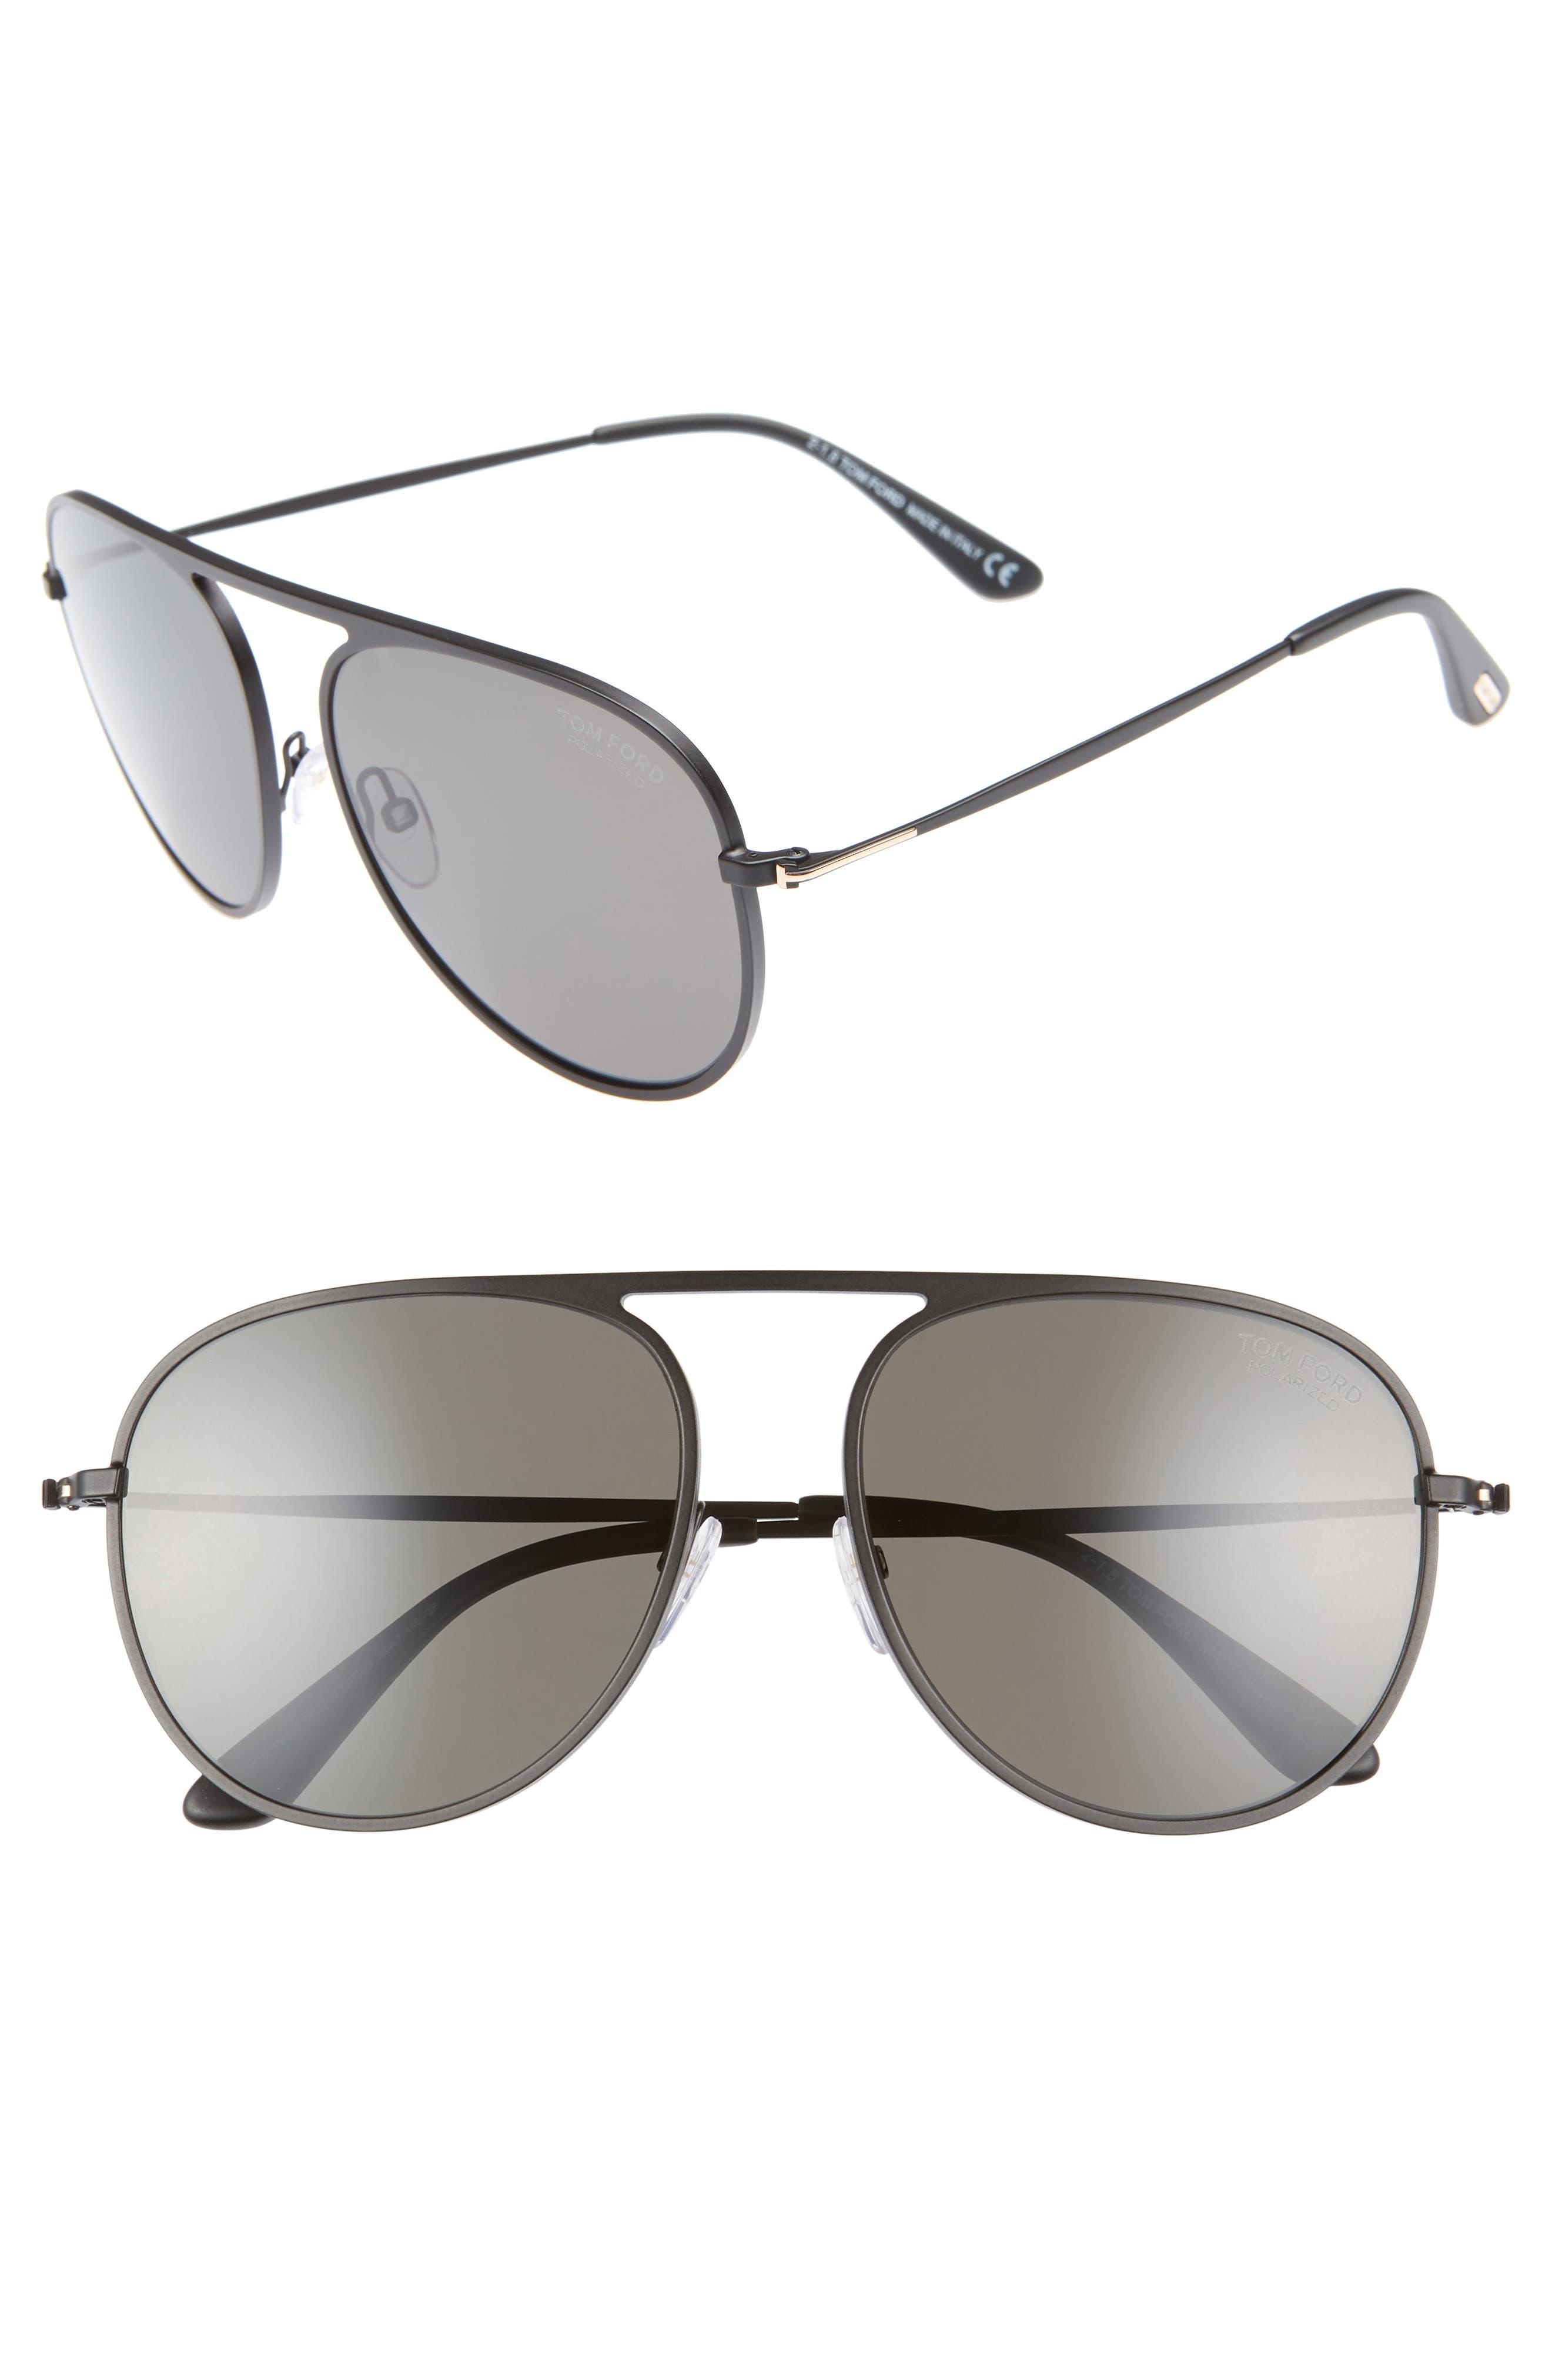 59mm Aviator Sunglasses,                             Main thumbnail 1, color,                             BLACK MATTE FRAME/ BLACK